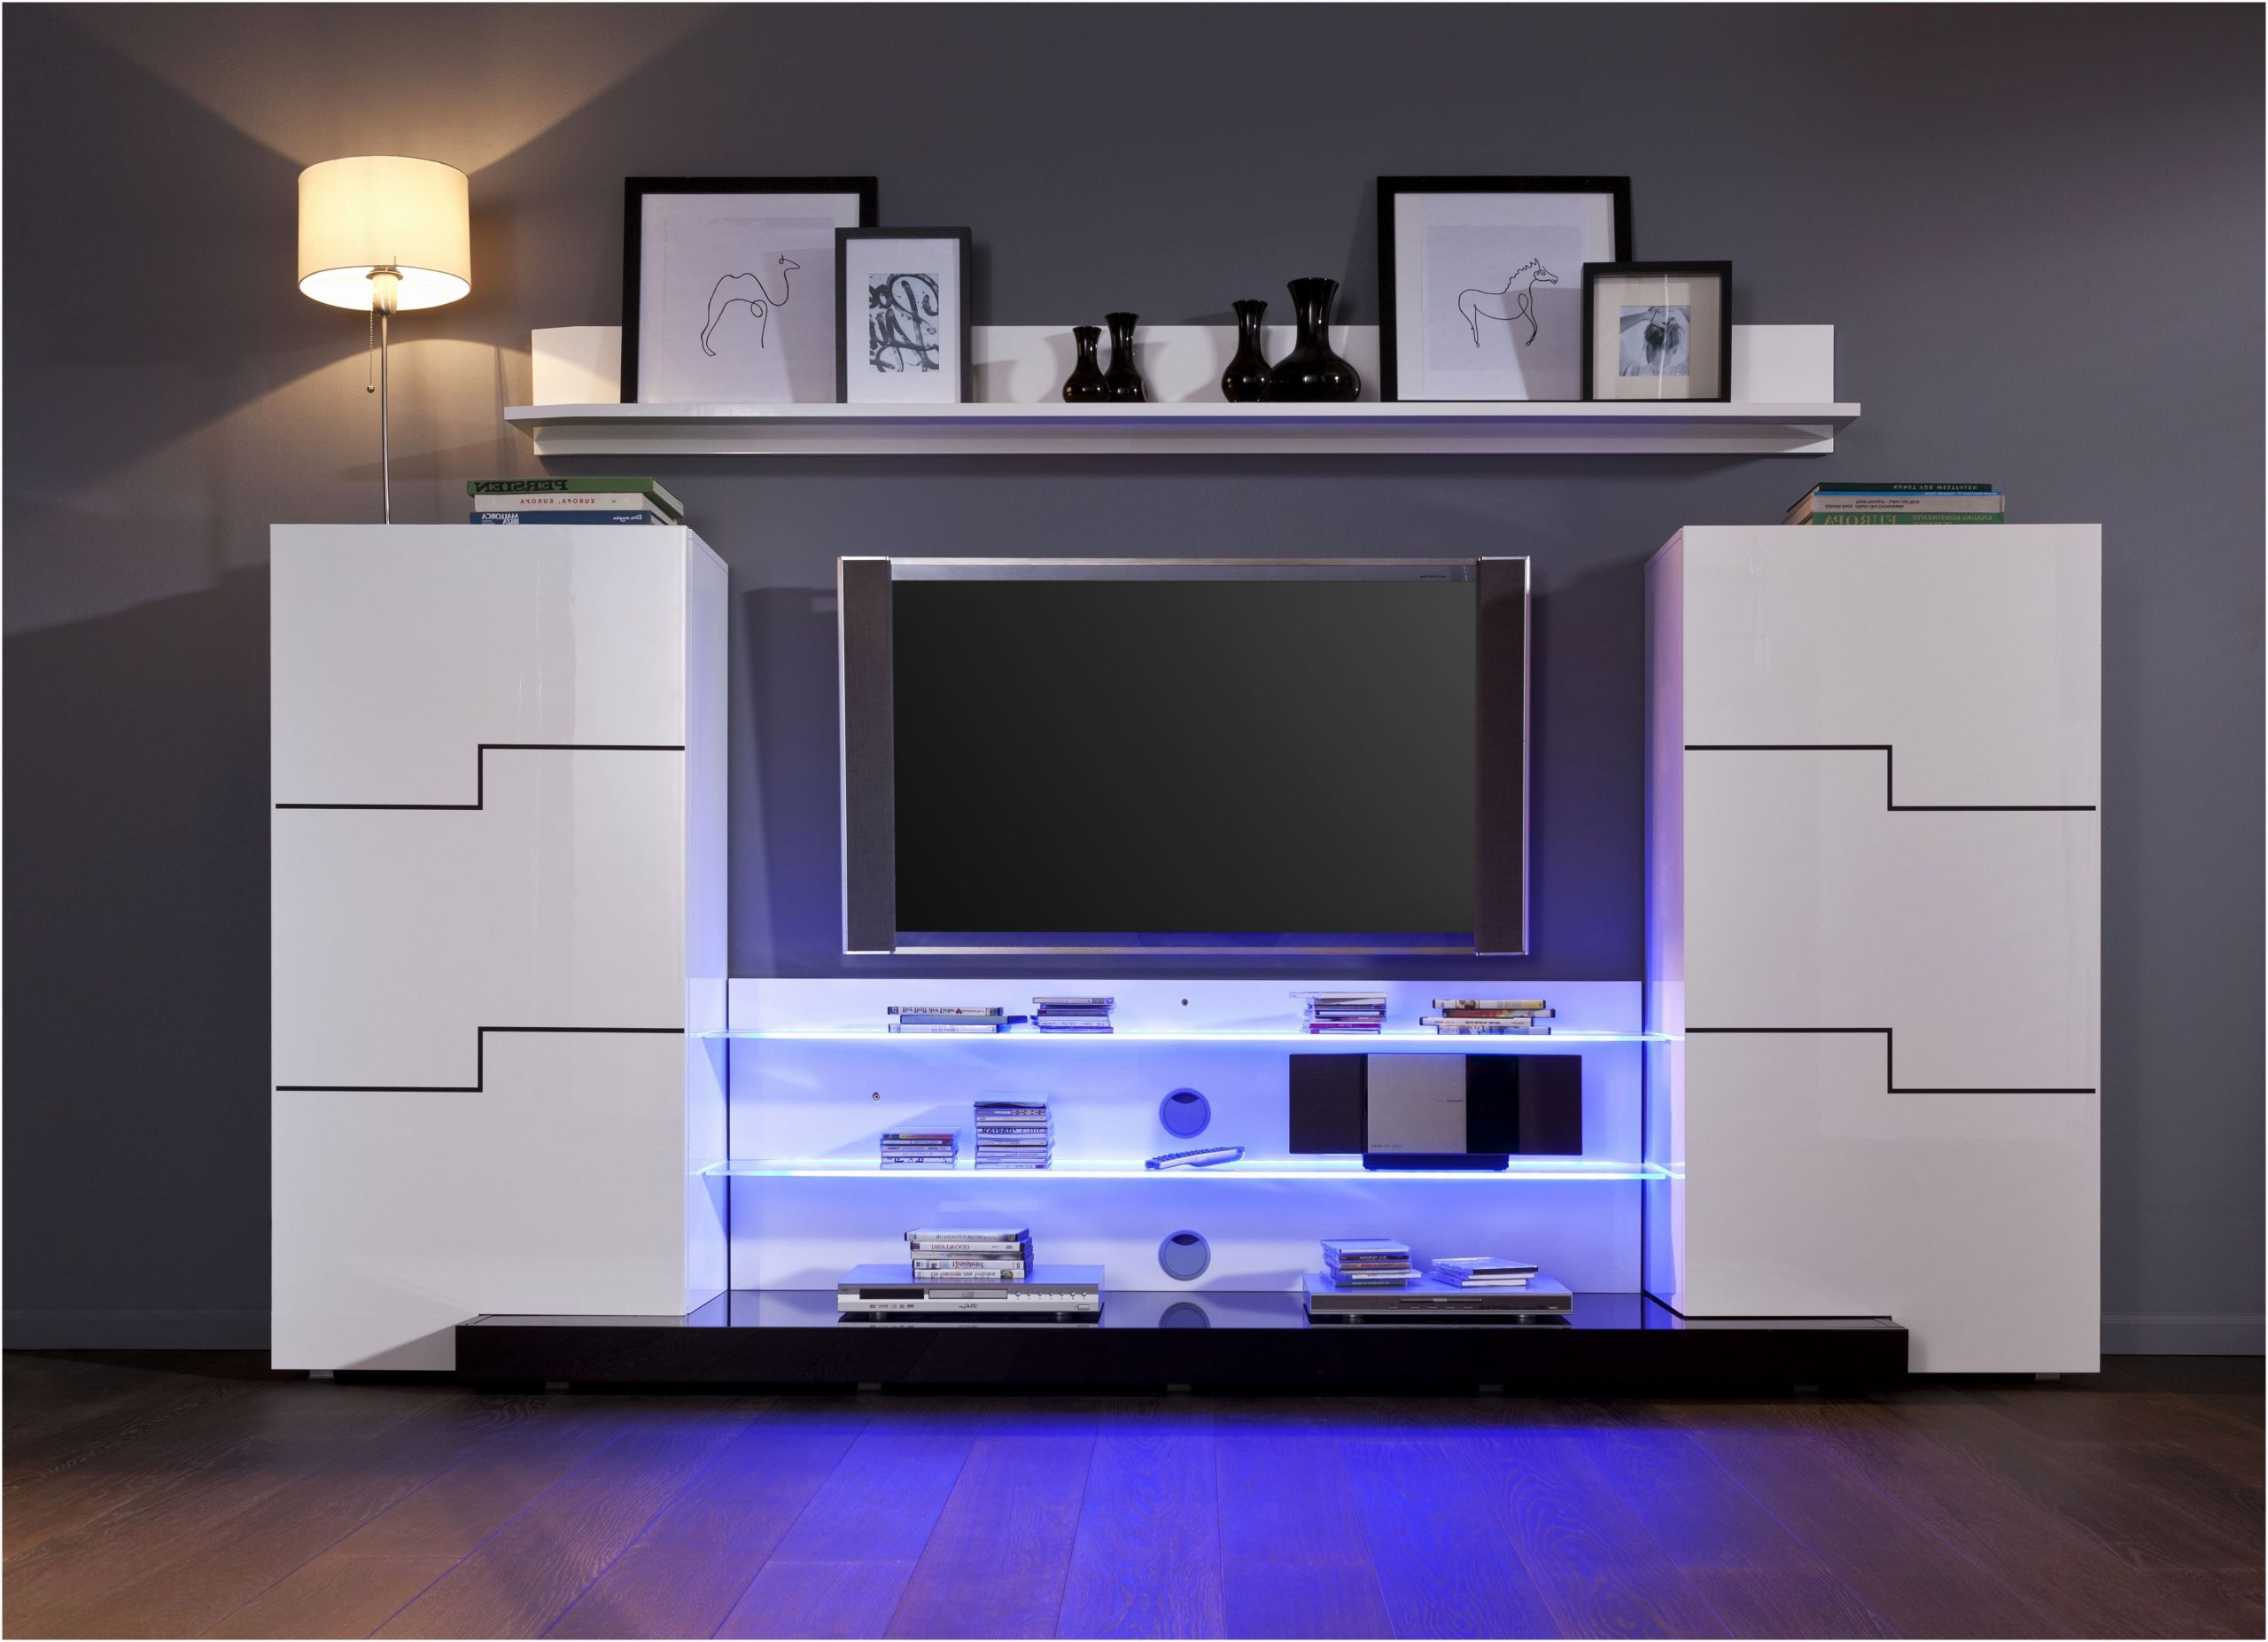 meuble tele groupon 84 concept meuble tv groupon meubles of meuble tele groupon